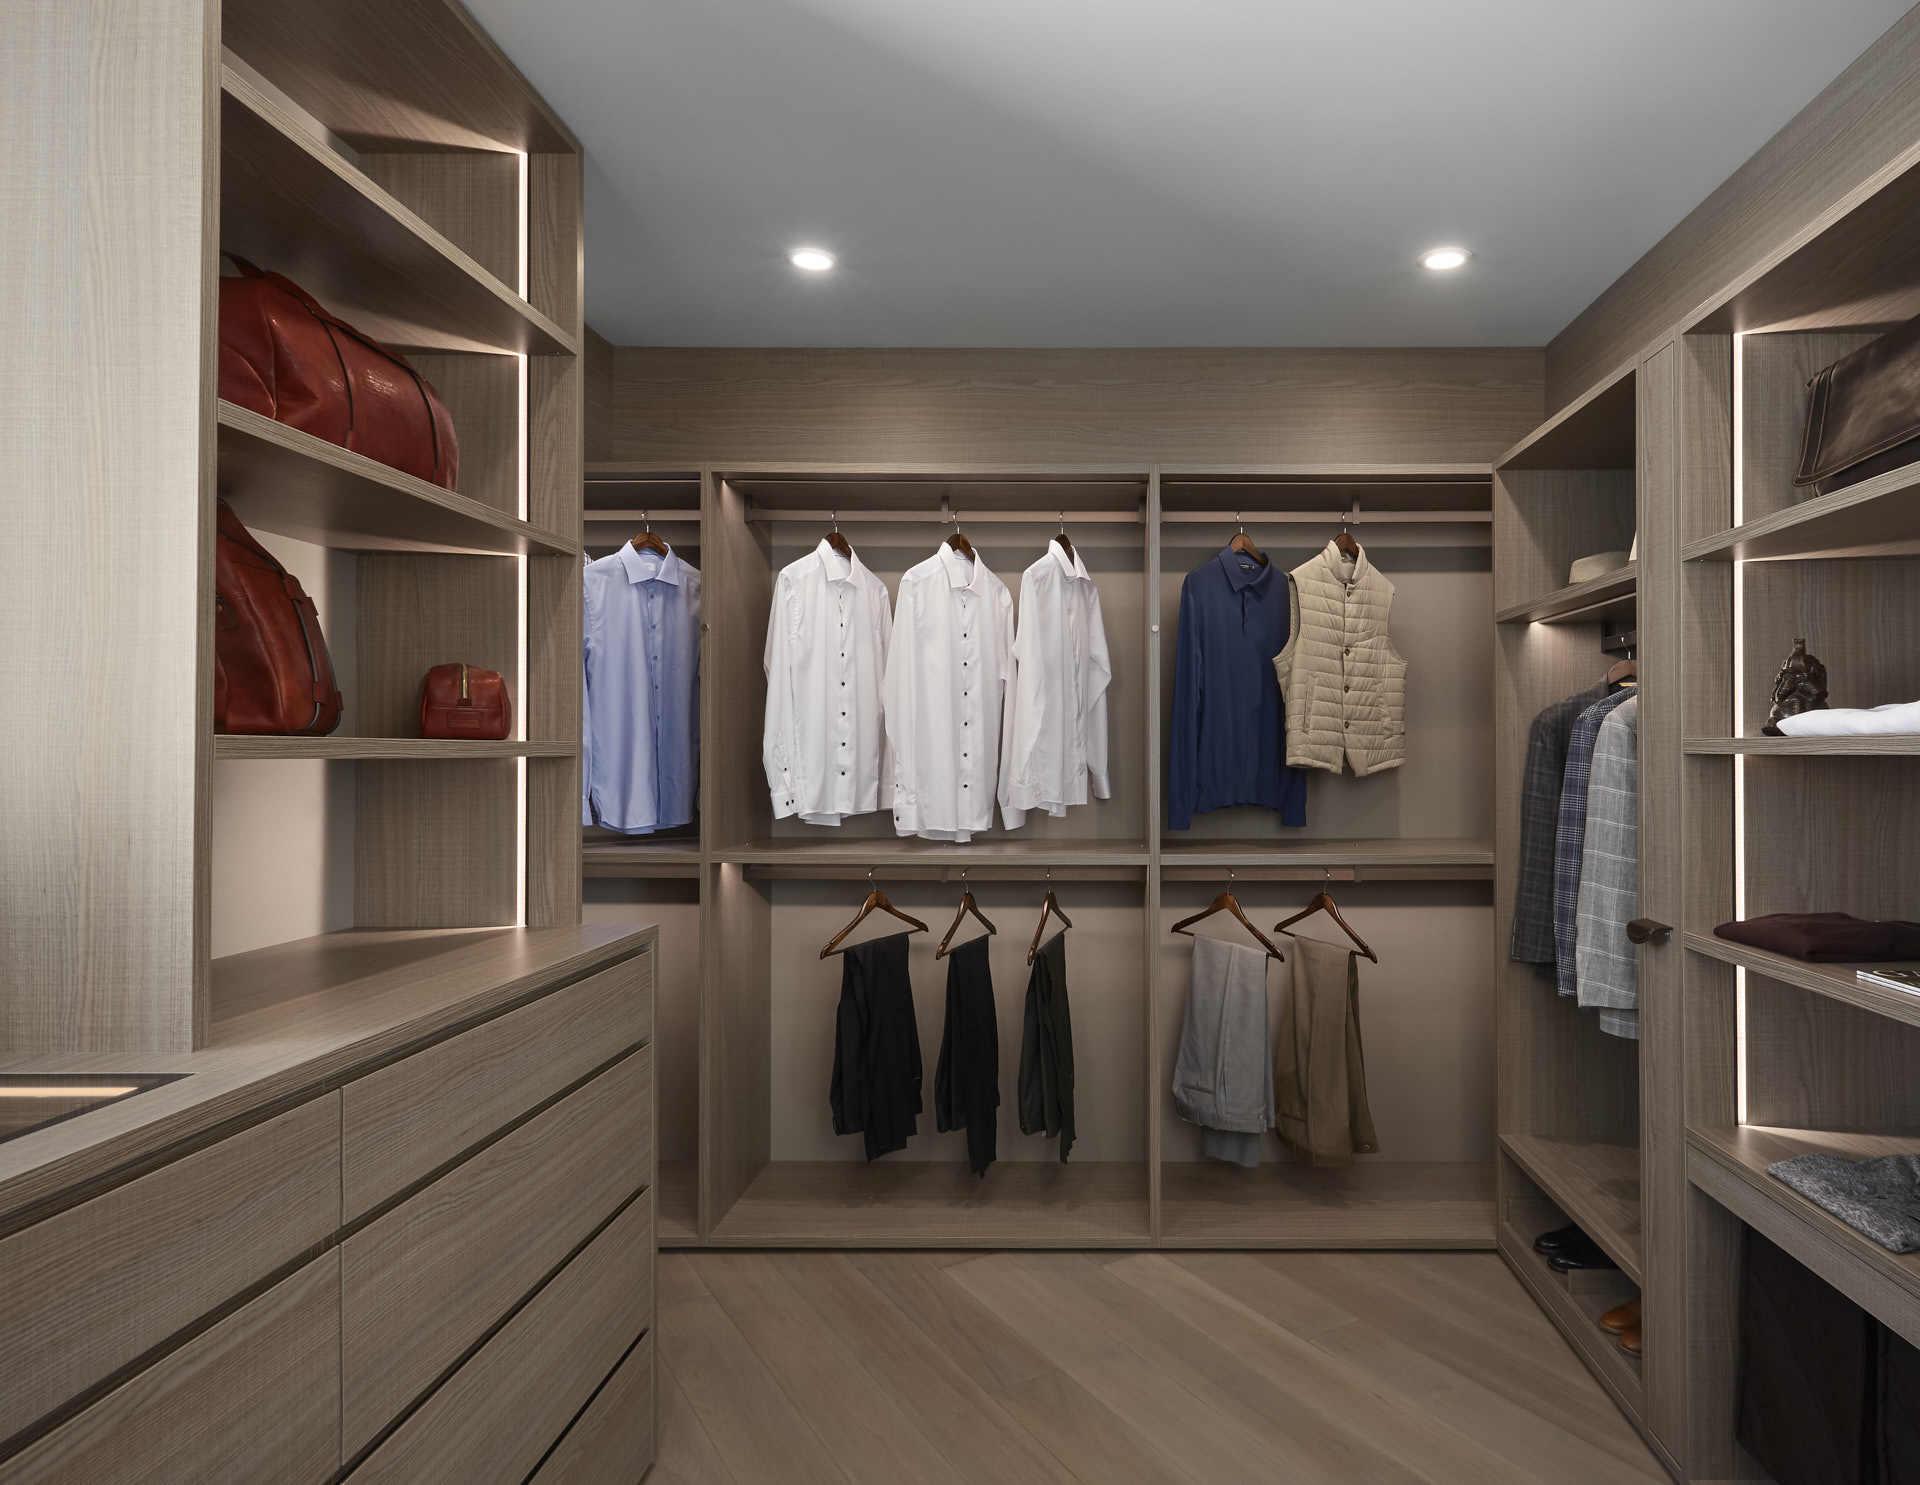 bespoke walk-in wardrobe using mid-tone finishes to achieve a masculine beachy feel